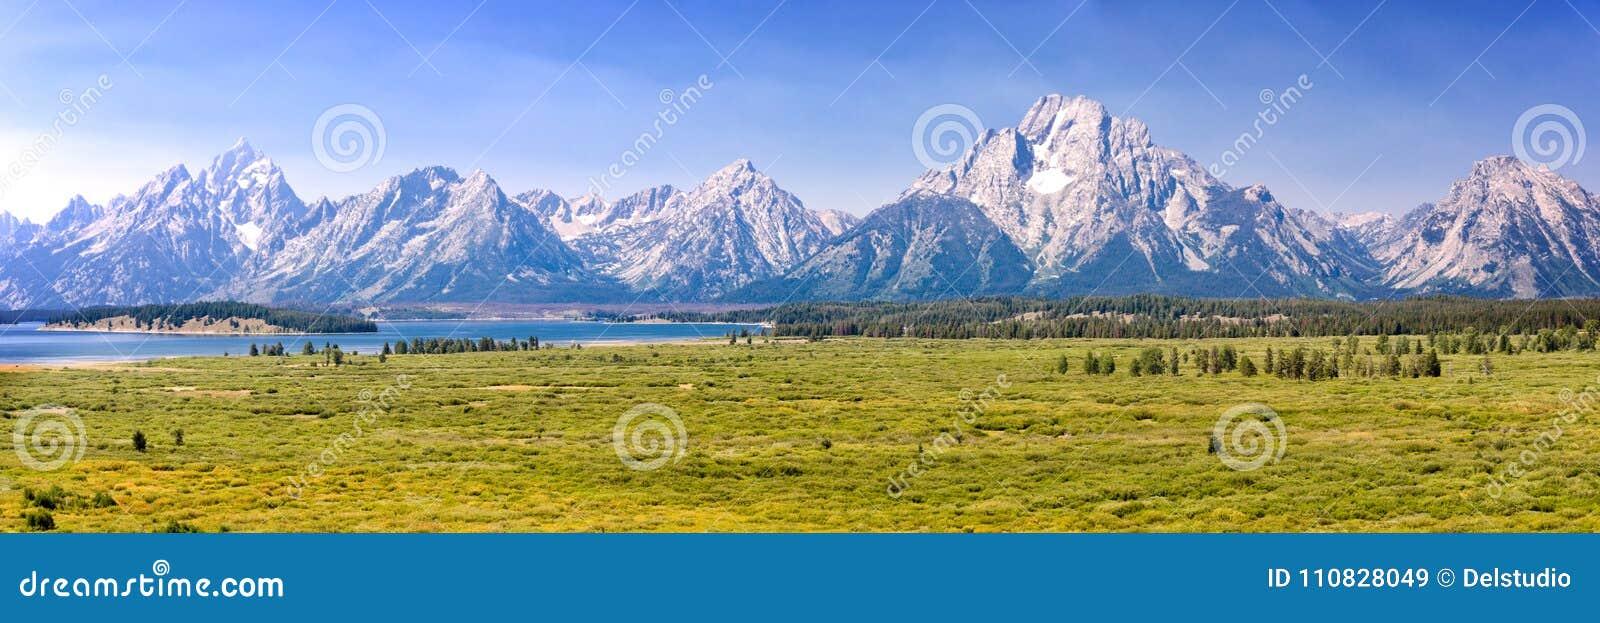 Parque nacional grande de Teton, panorama da cordilheira, Wyoming EUA